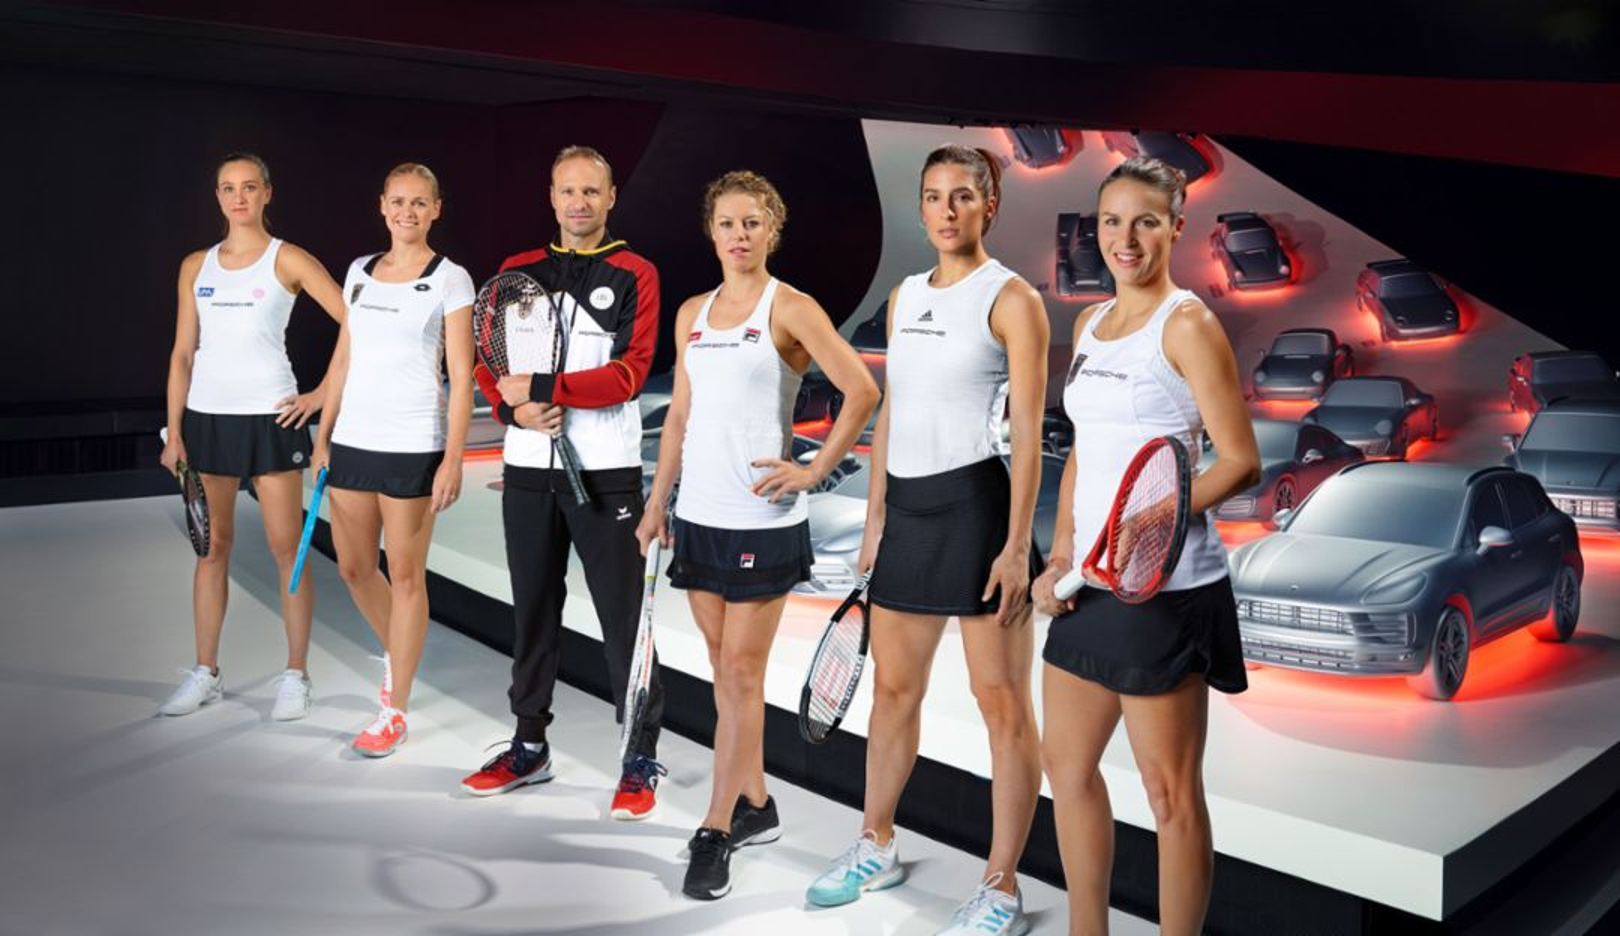 Porsche Team Germany, Porsche Pavillon, Autostadt Wolfsburg, 2019, Porsche AG